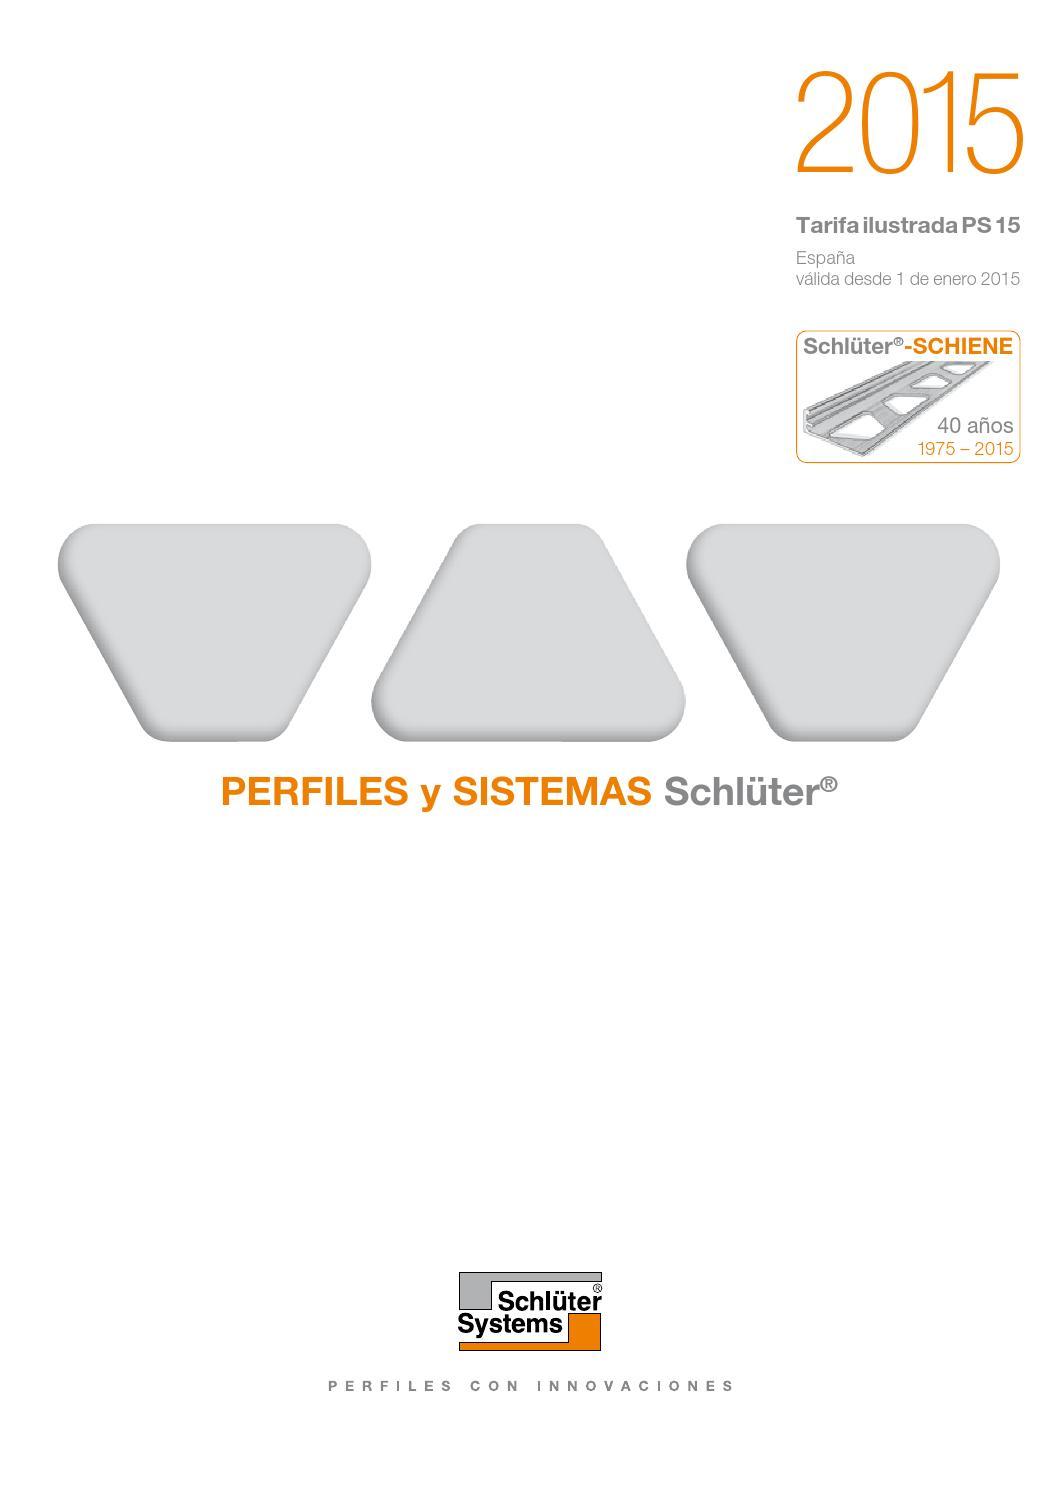 Catálogo Schlüter System 2015 by Cymper - issuu